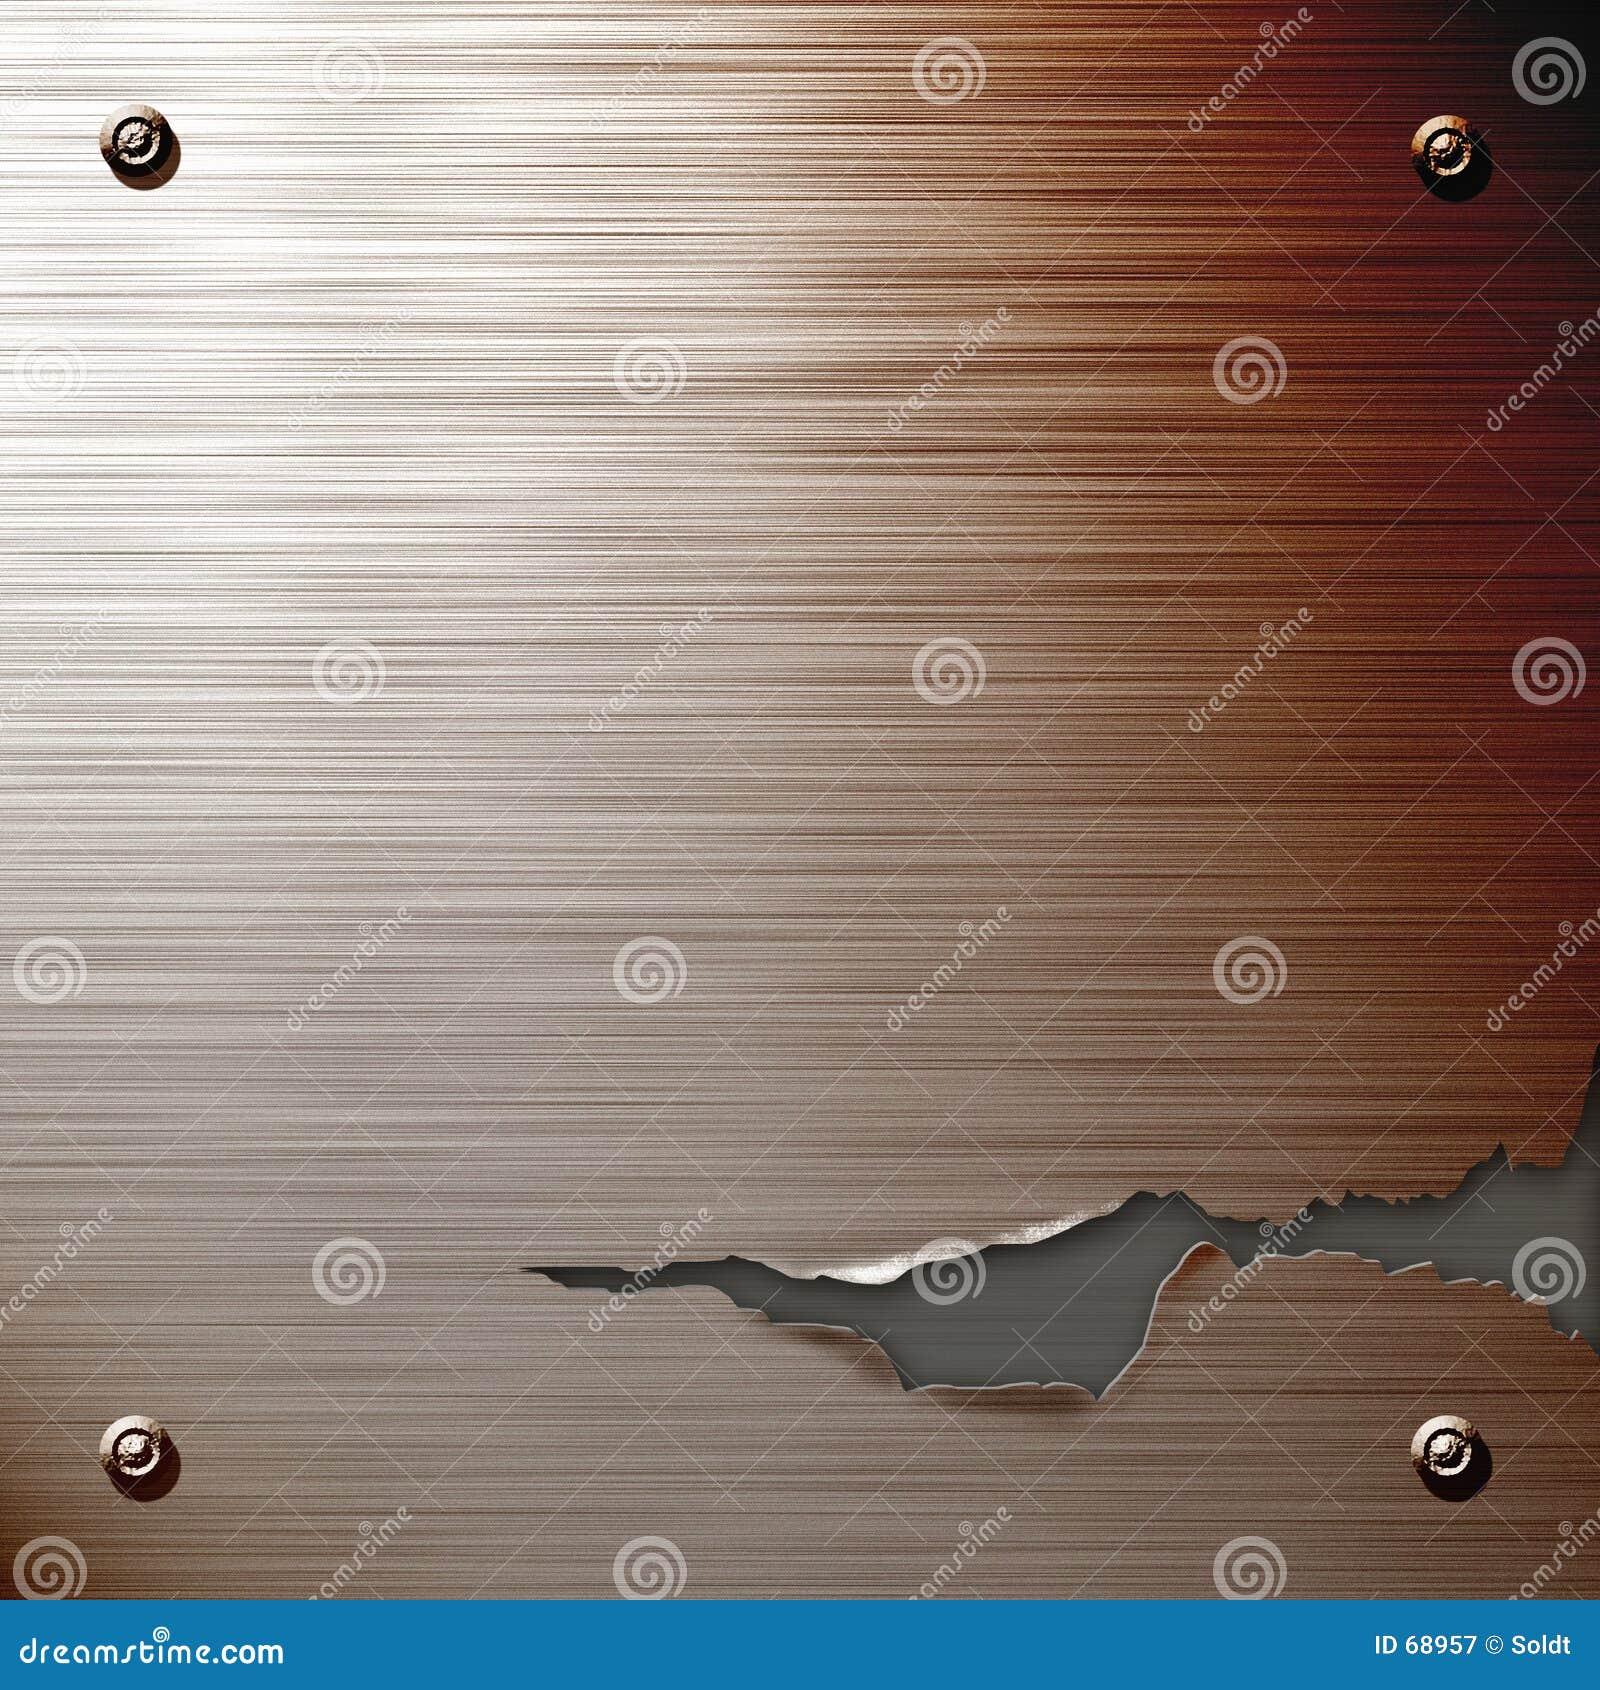 Cracked plate steel